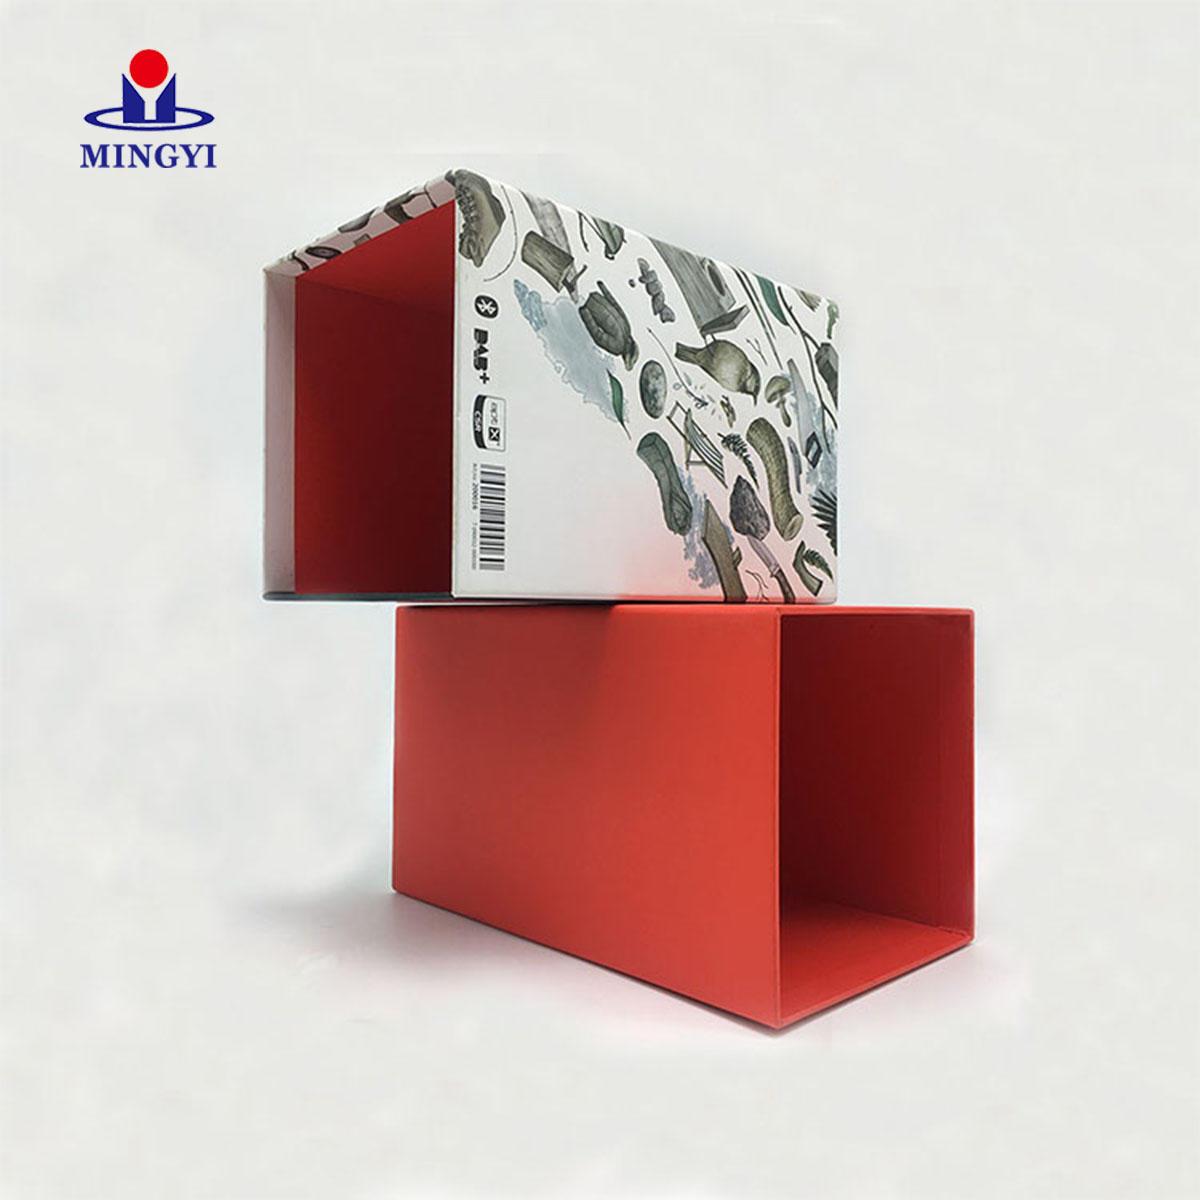 window ceremony eva design watch gift box Mingyi Printing-gift box- hang tags- packaging stickers-Mi-1